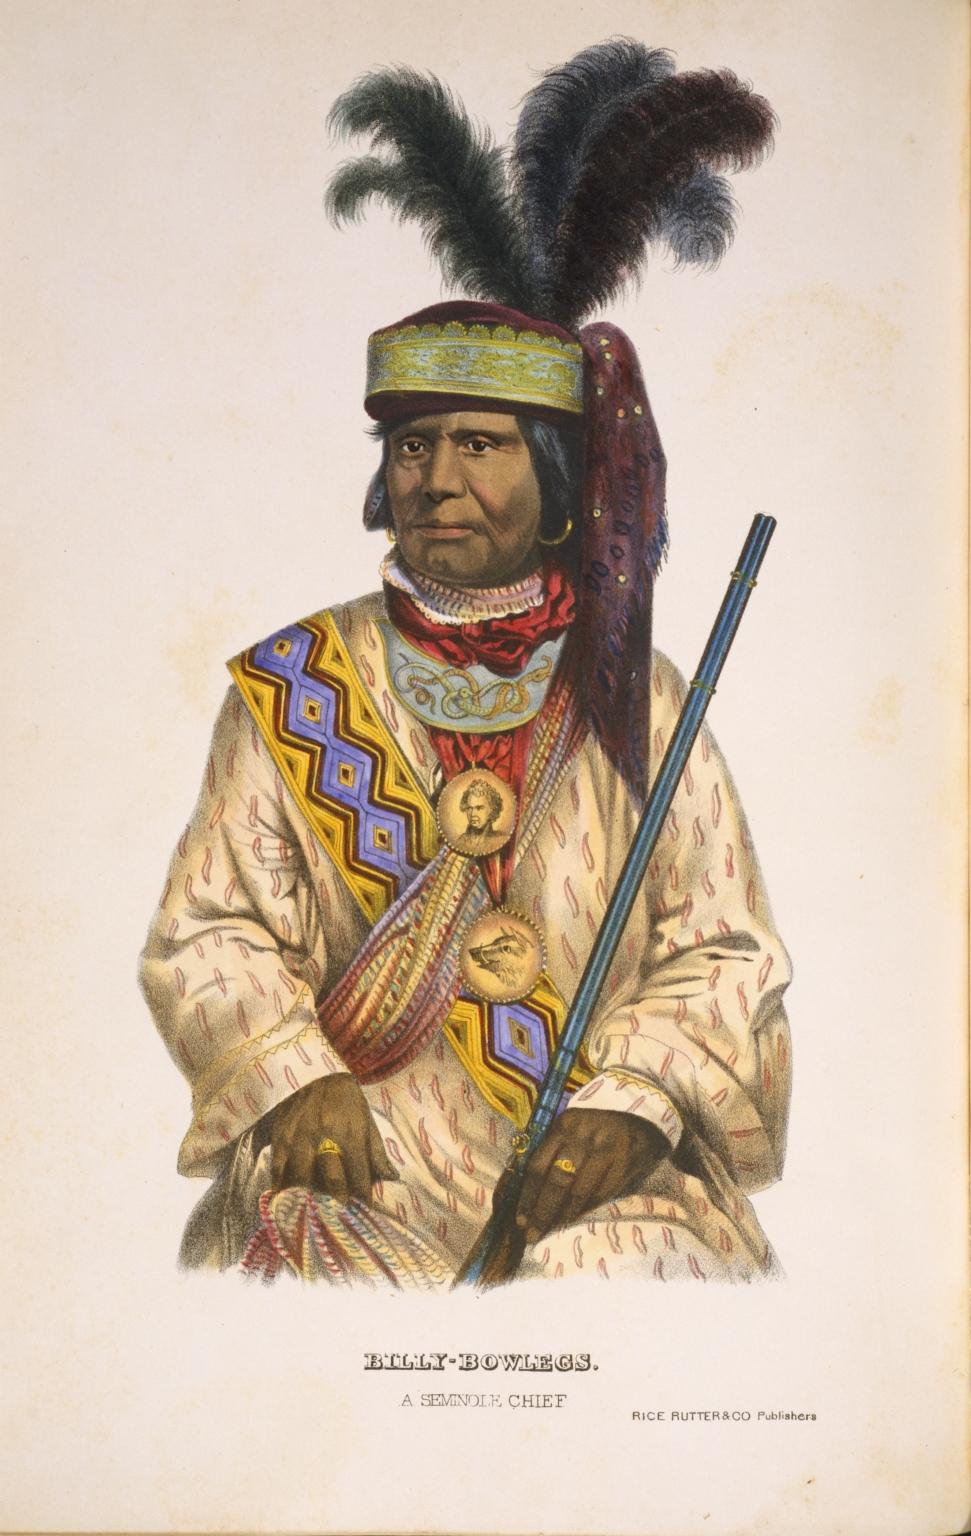 Billy Bowlegs, A Seminole Chief